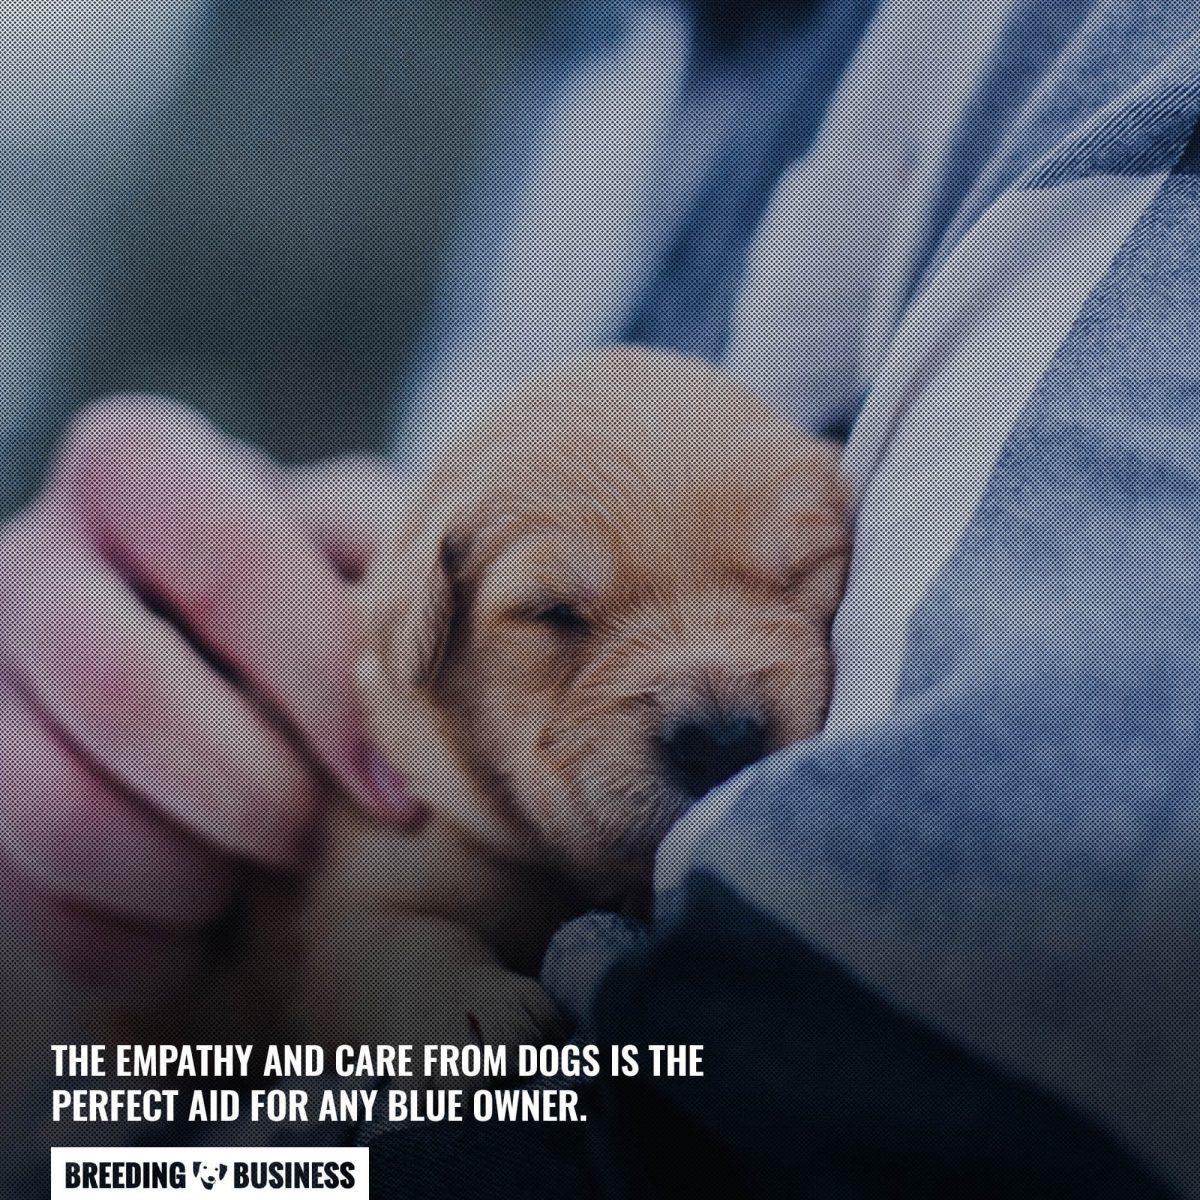 dogs comfort us